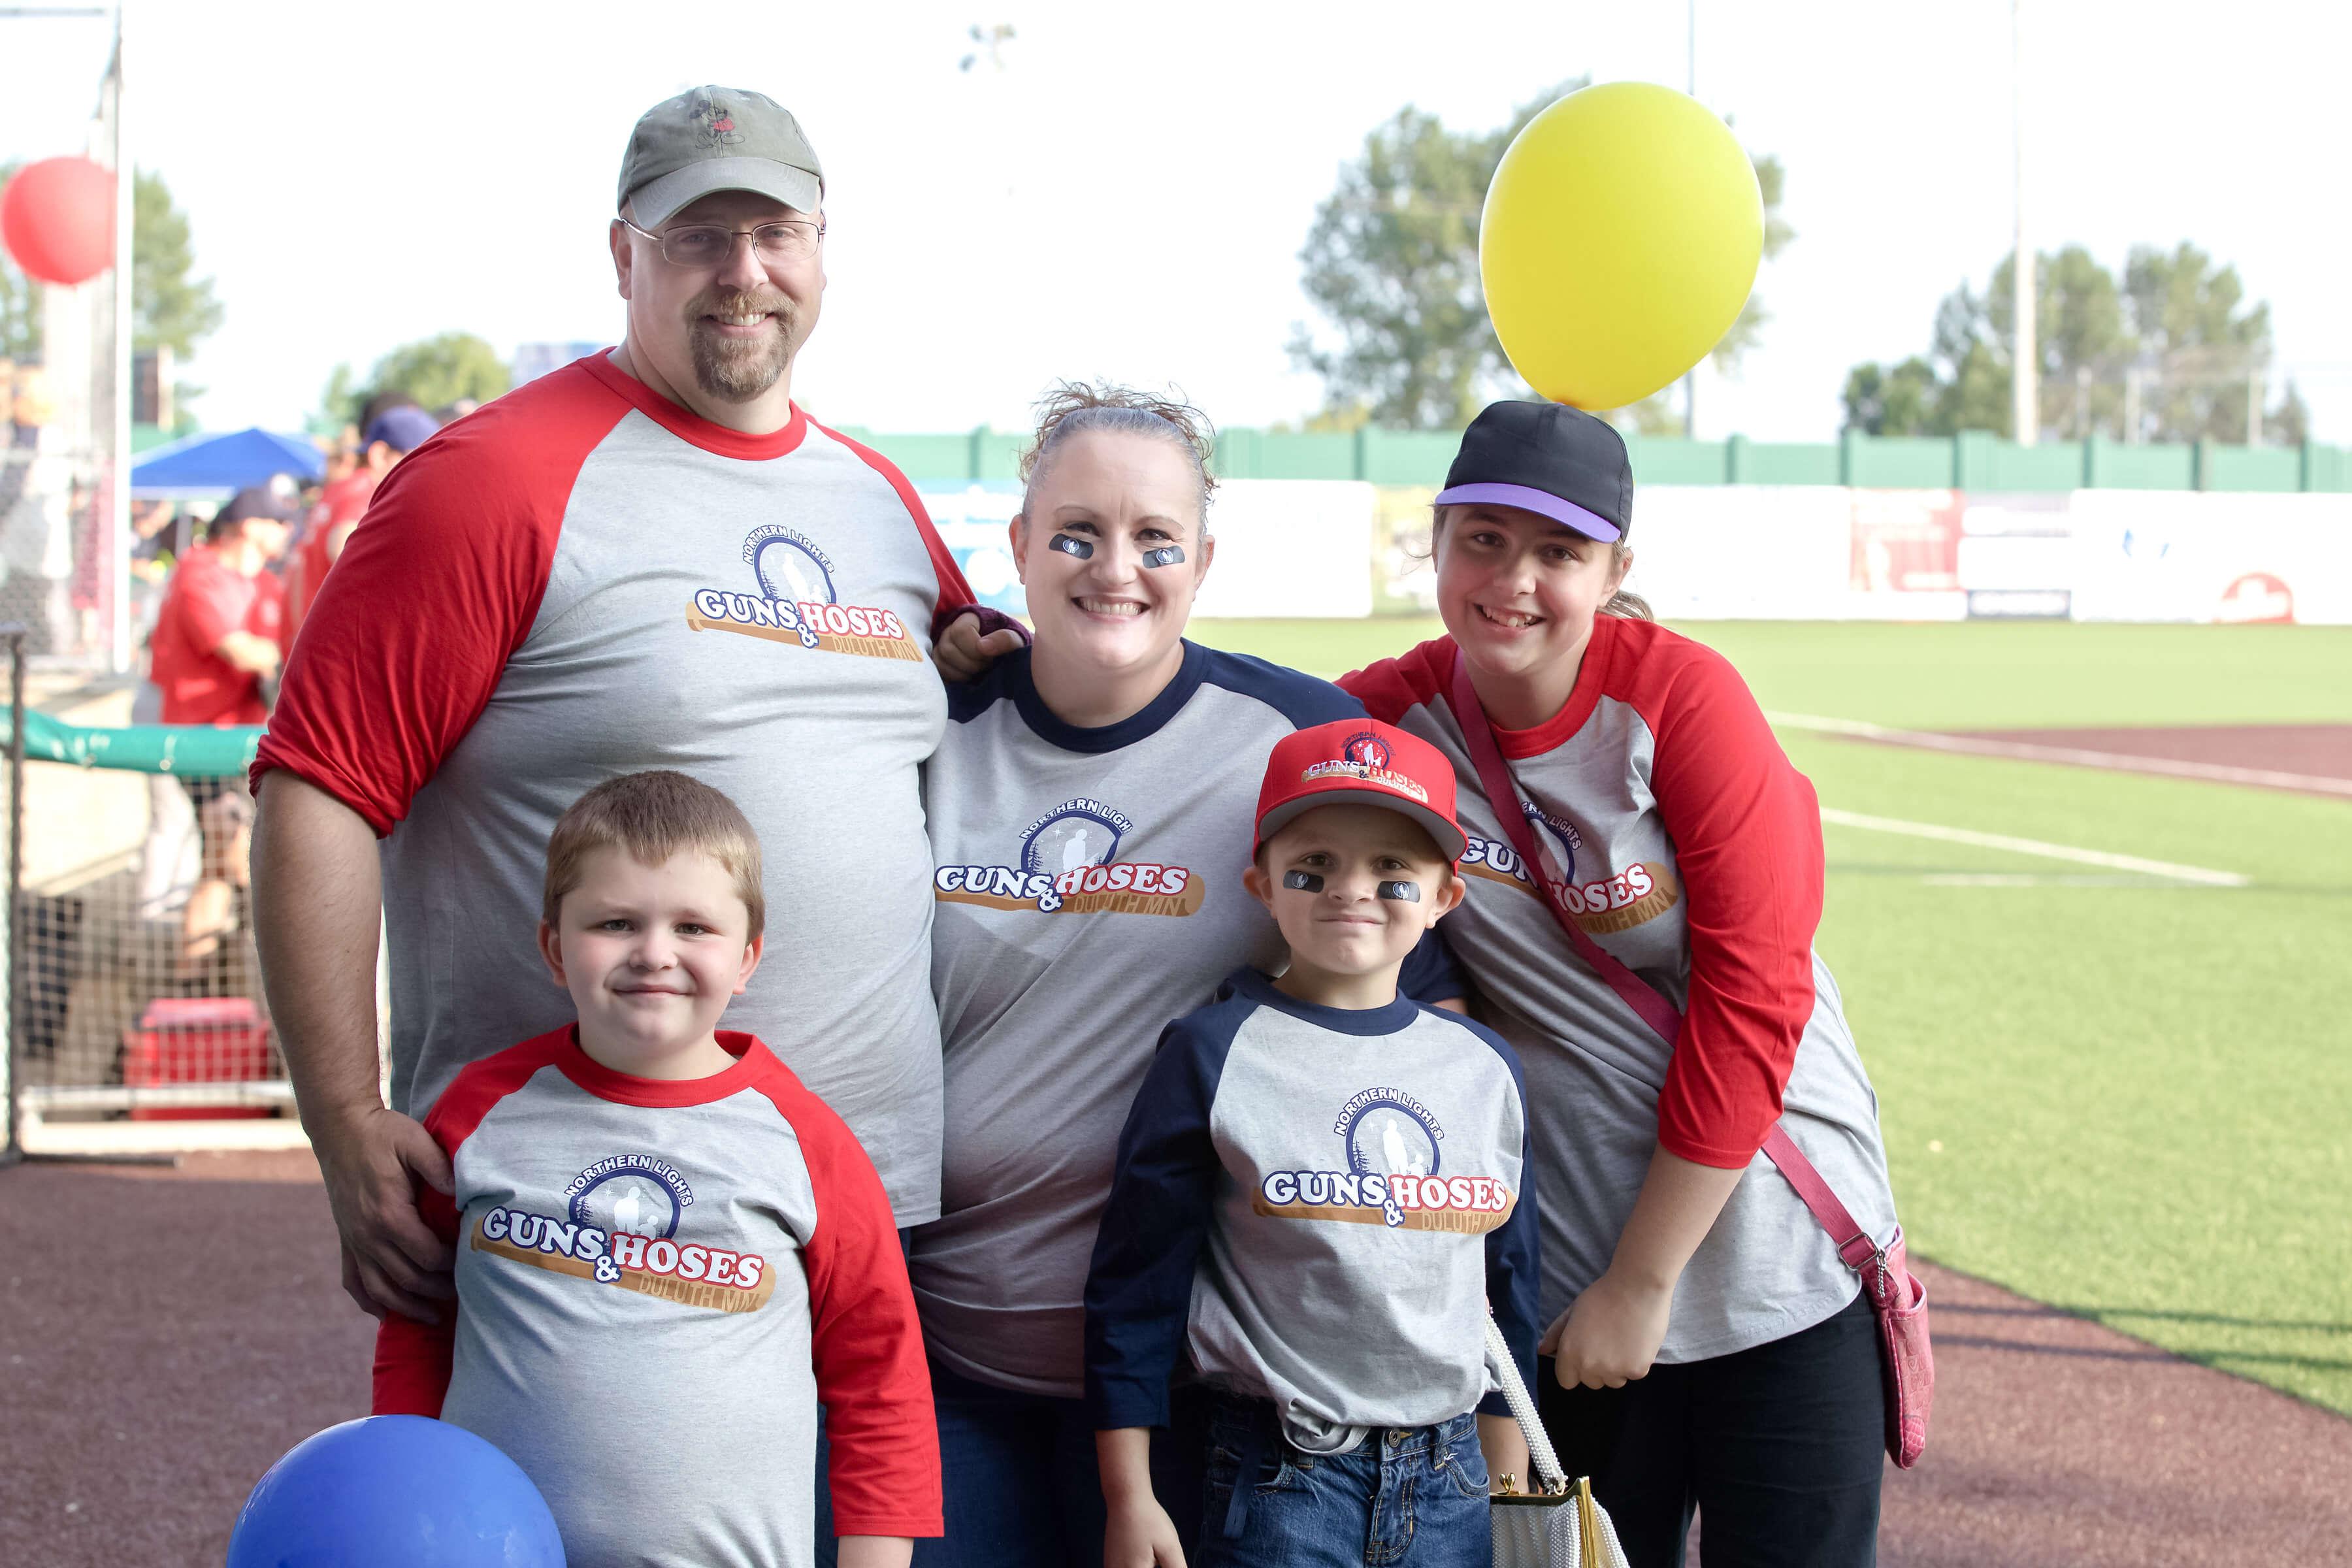 Northern Lights Foundation - Guns & Hoses family